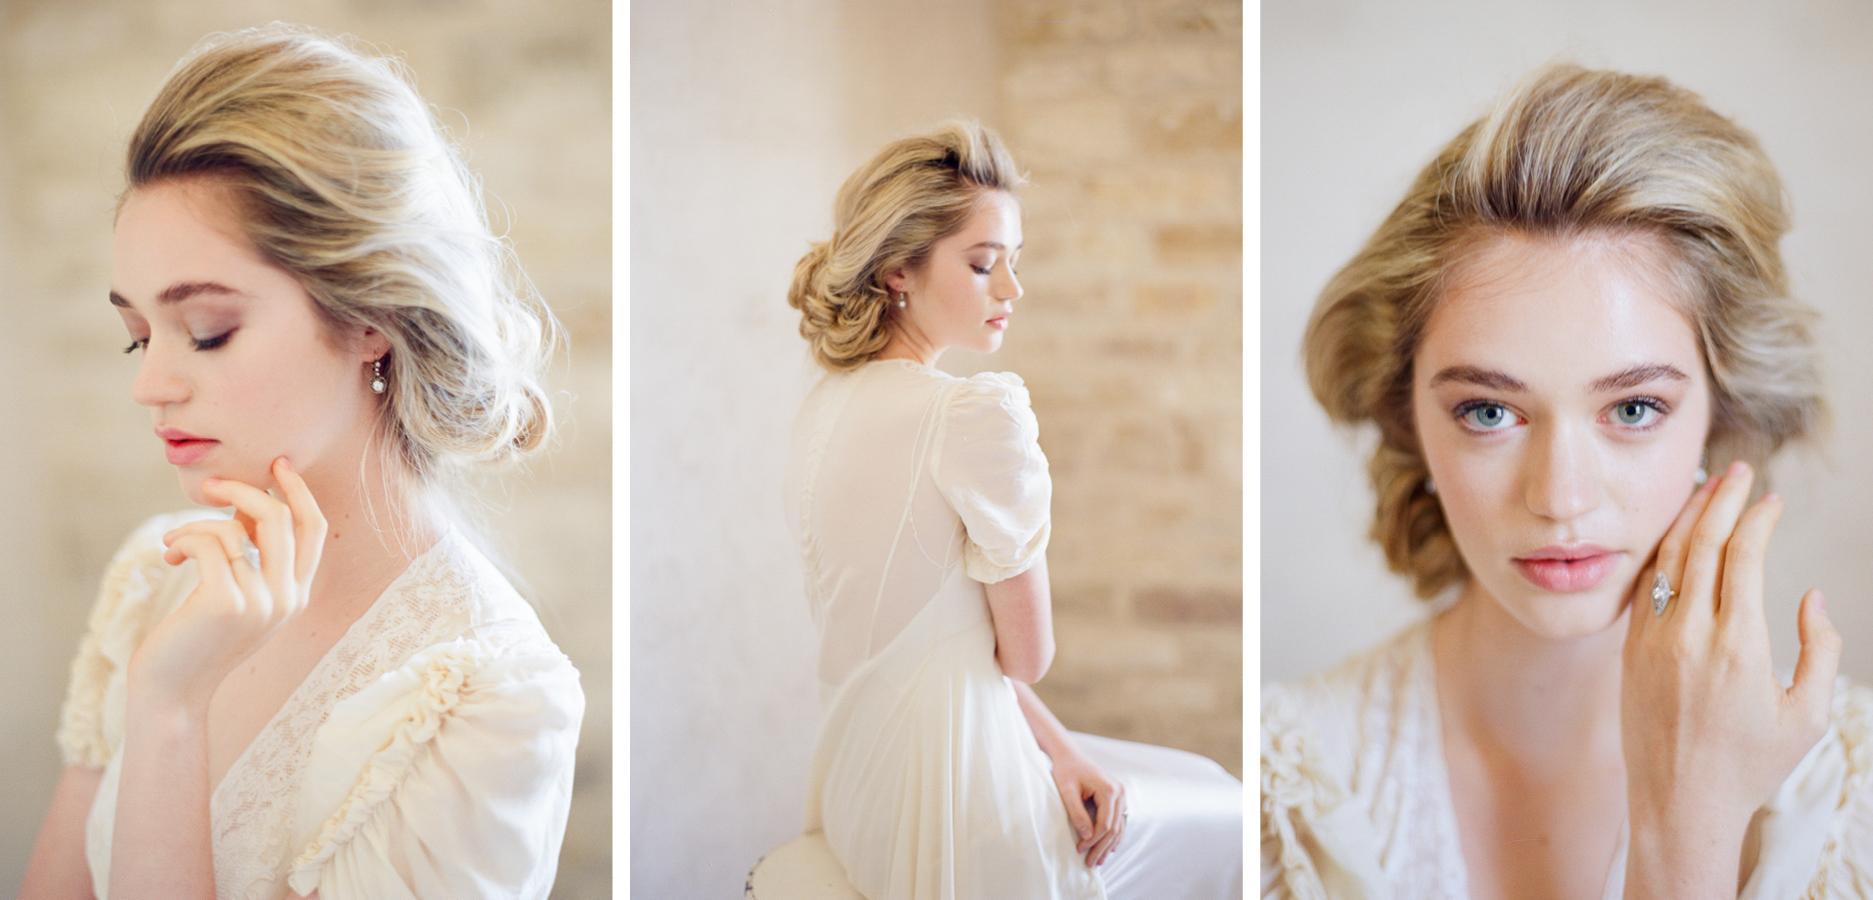 Jess-Wilcox-Hair-Makeup-Wedding-Homepage_4.jpg